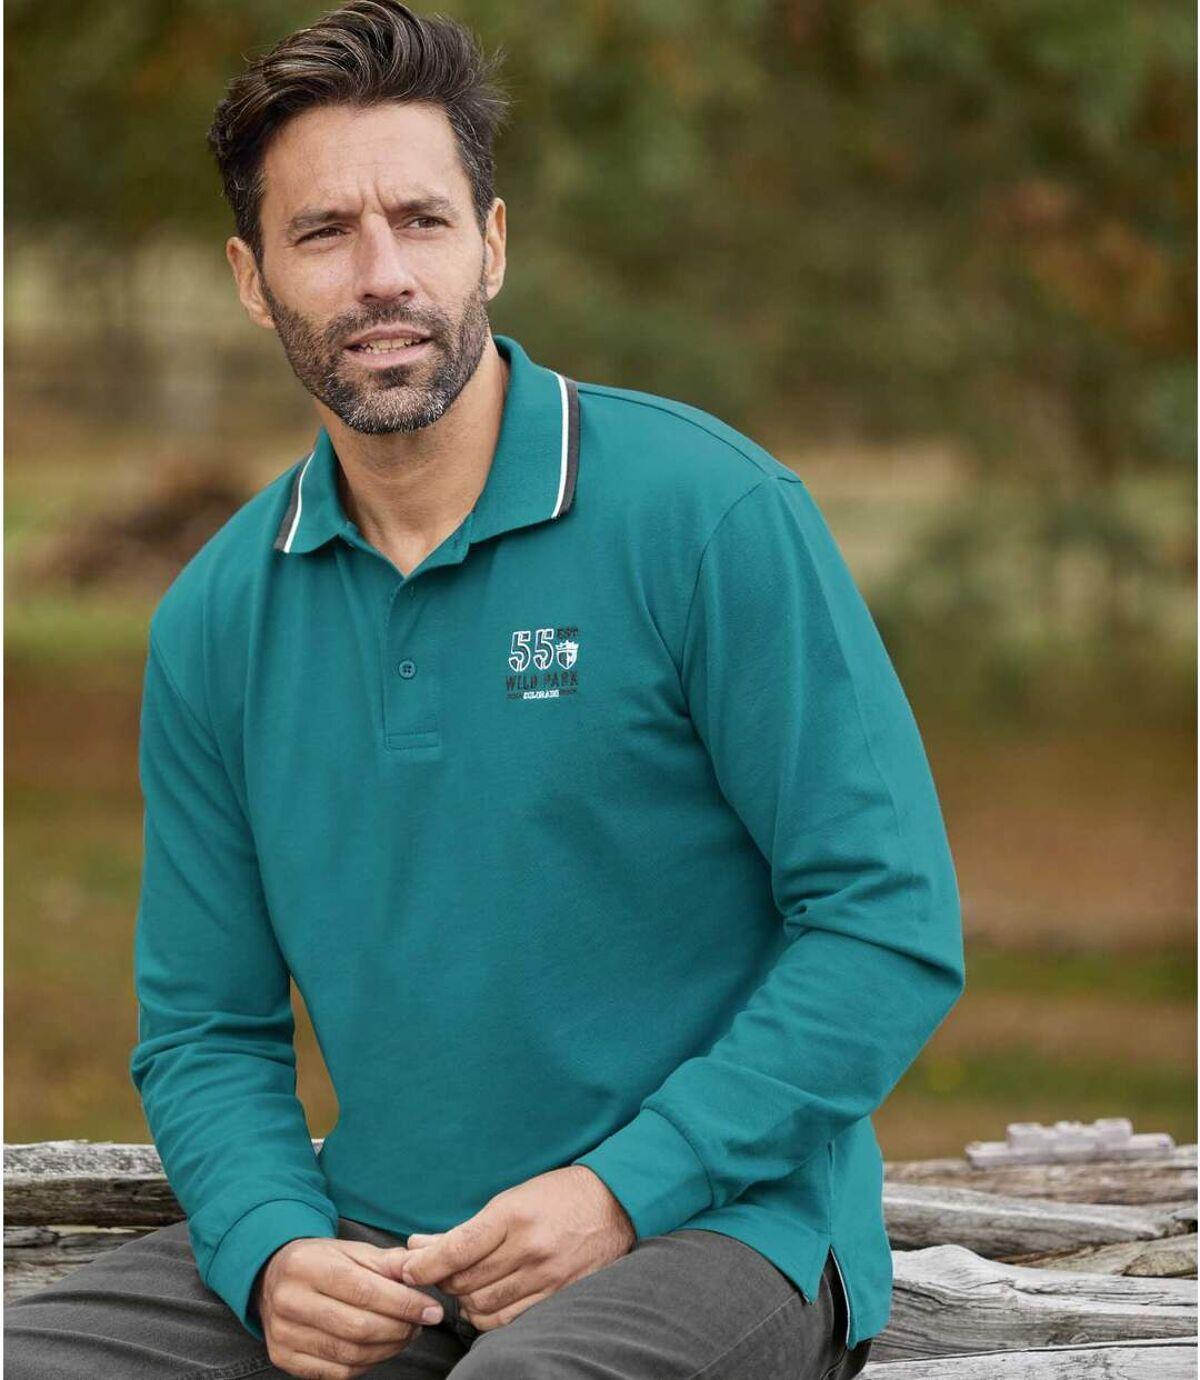 Pack of 2 Men's Long-Sleeved Piqué Polo Shirts - Green Gray Atlas For Men